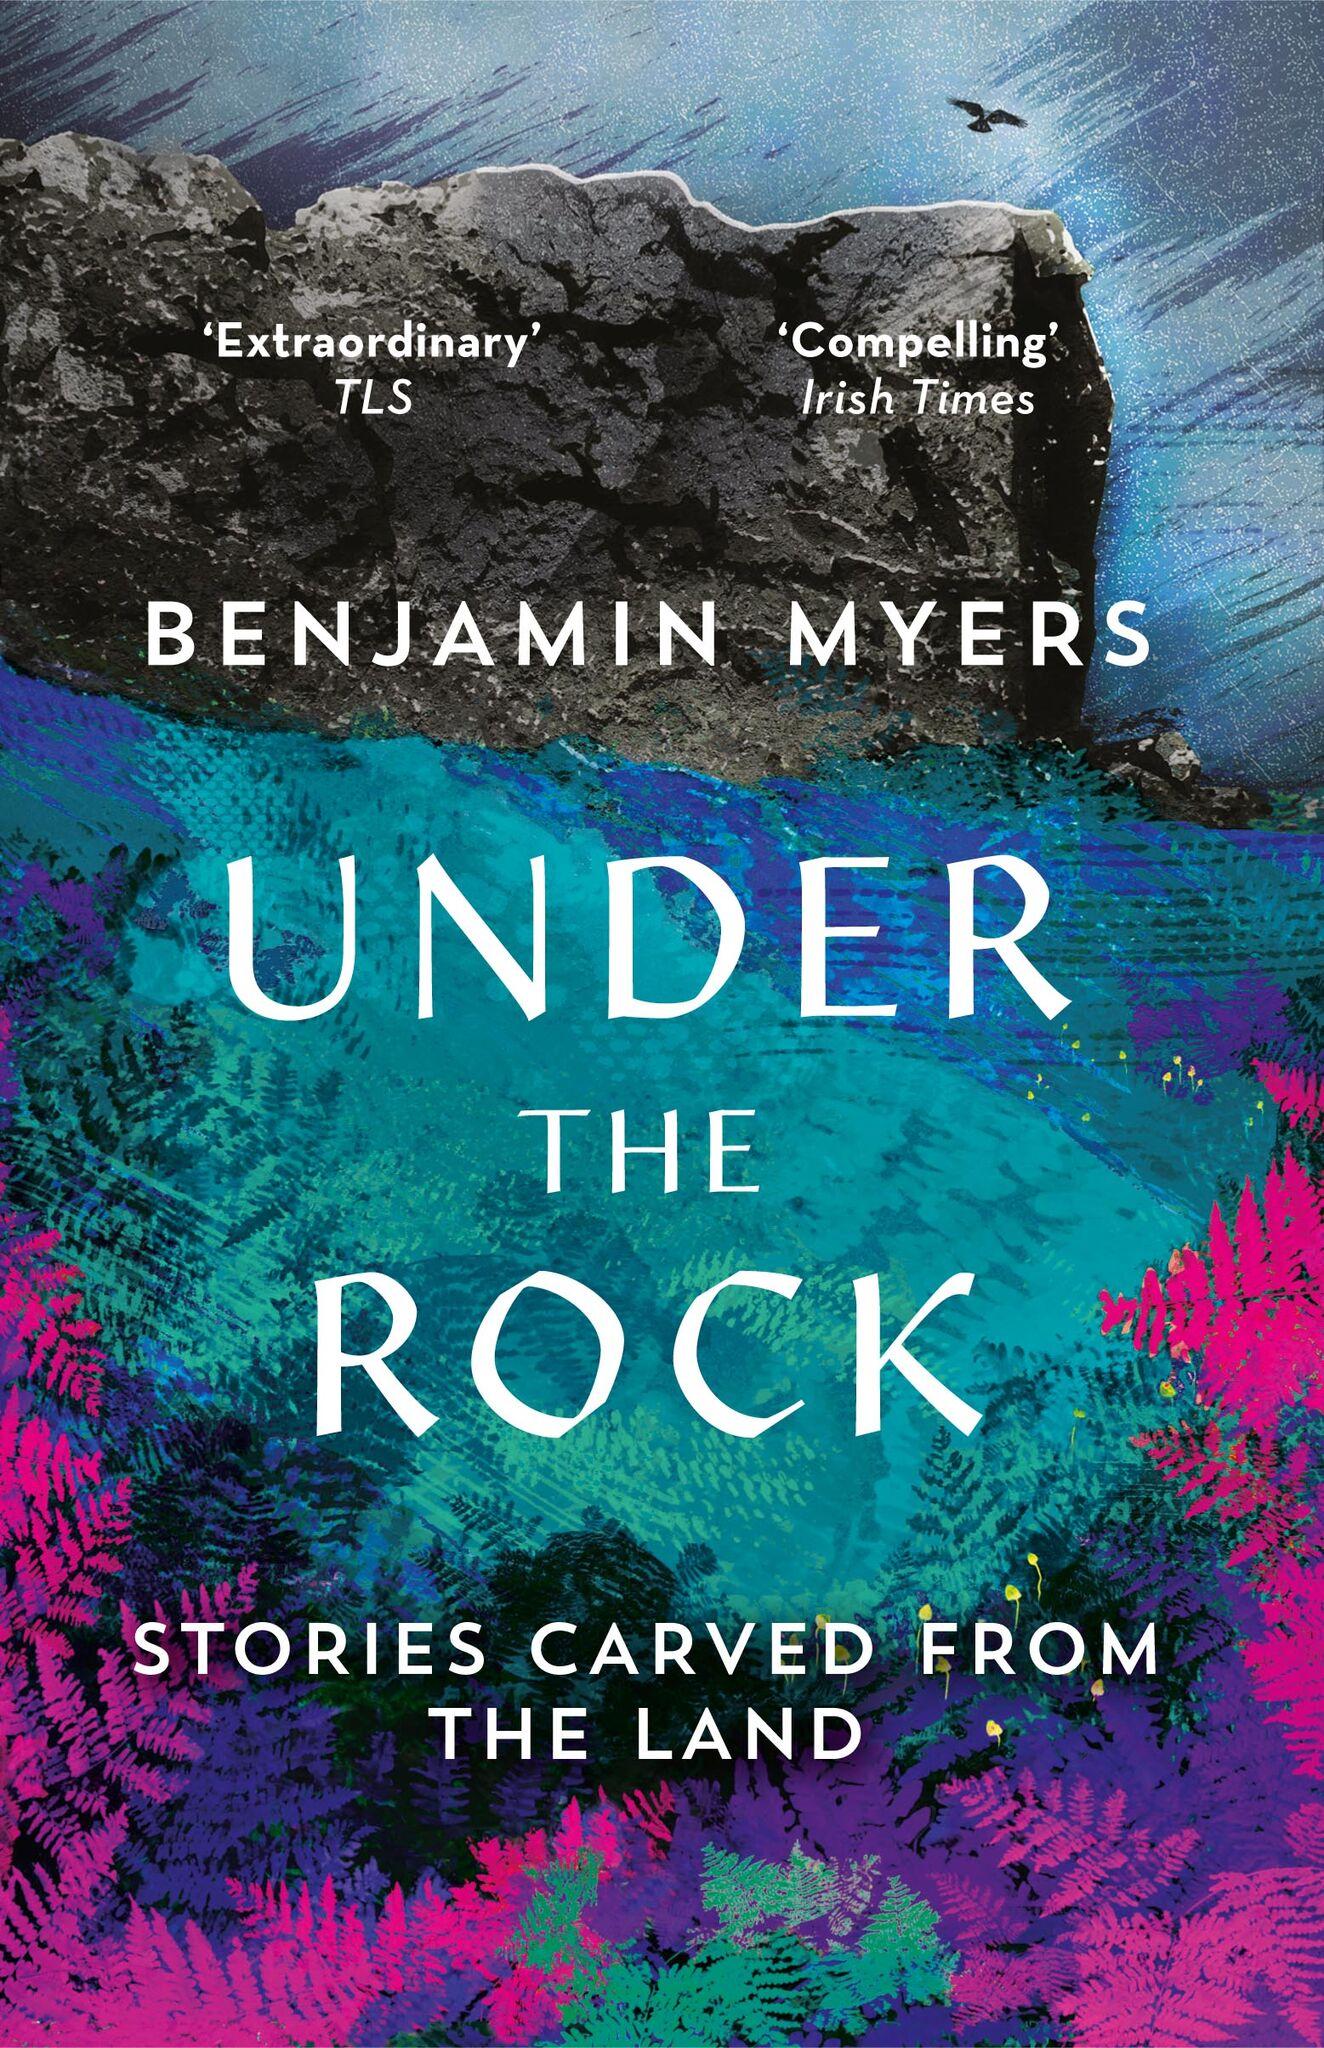 Under the Rock.jpeg